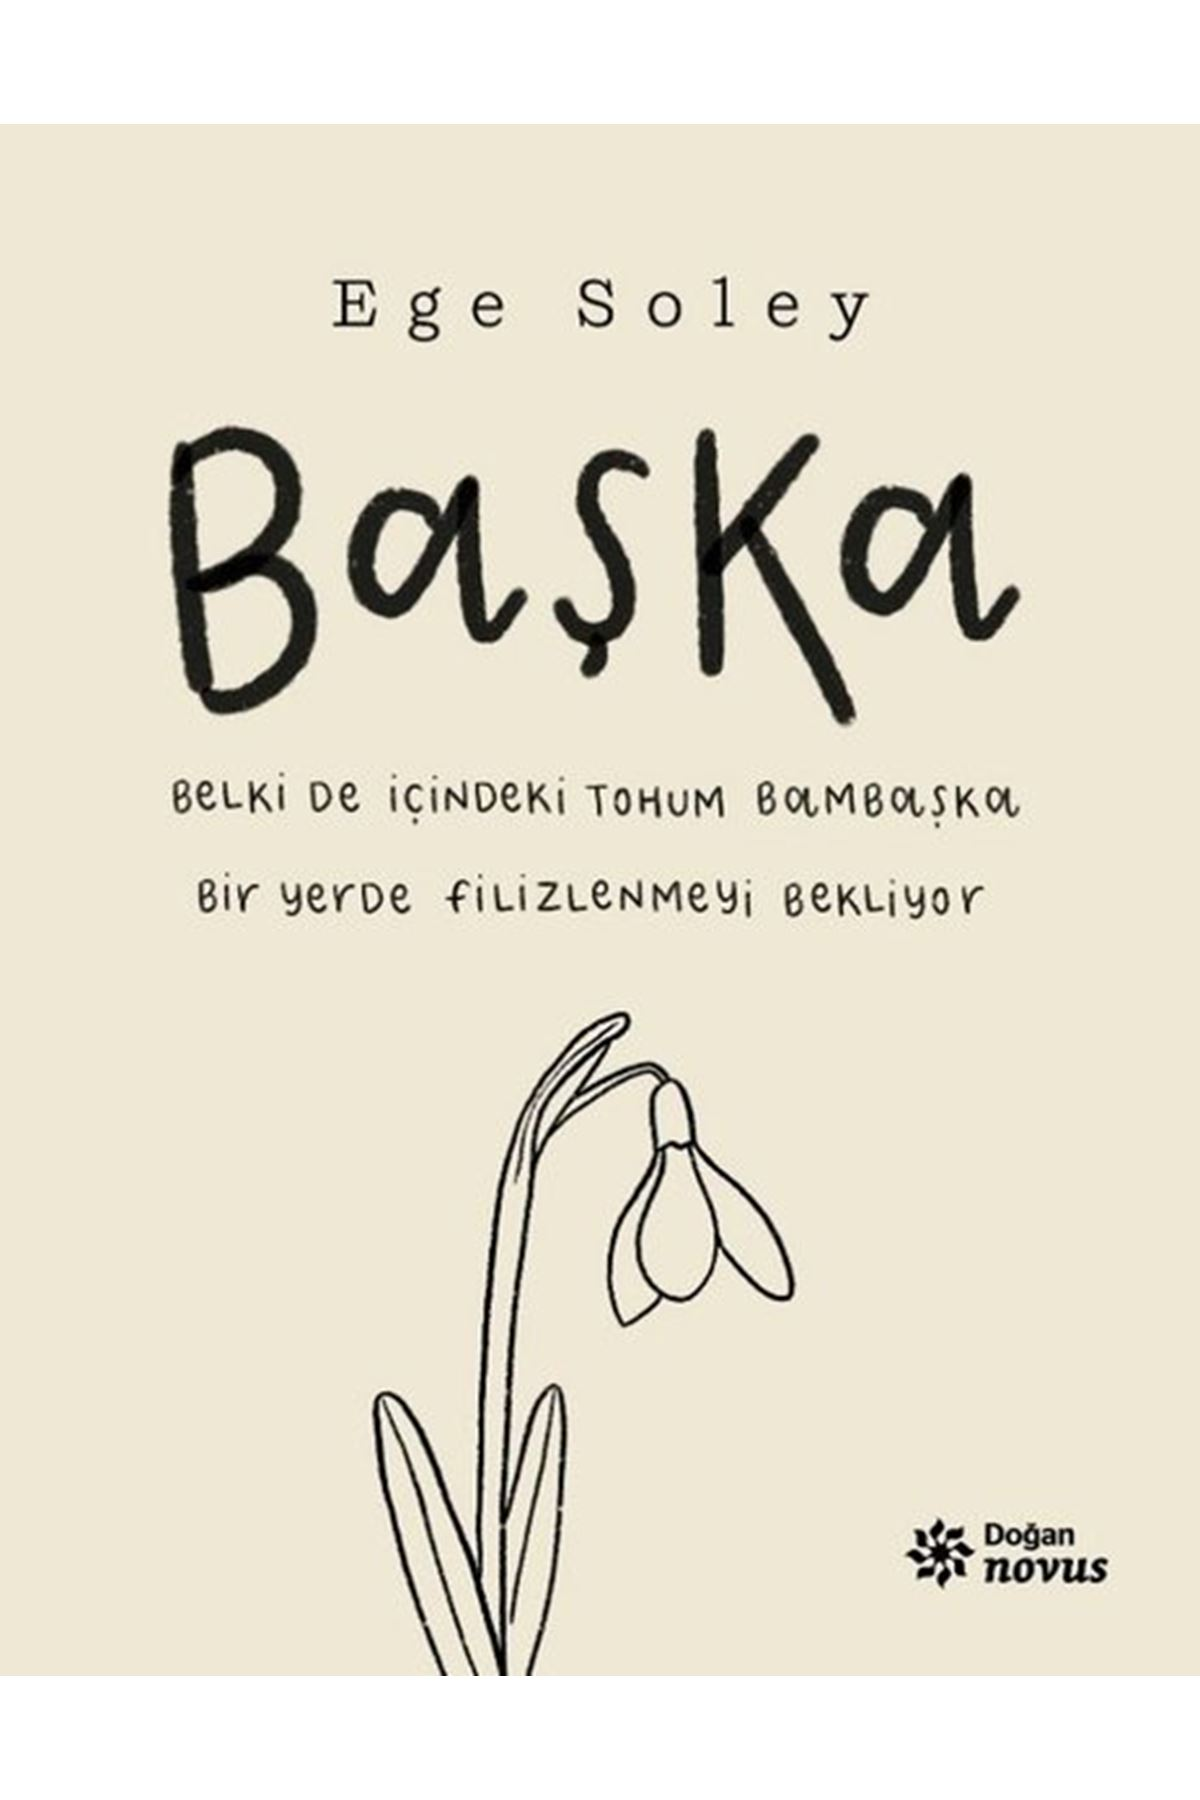 EGE SOLEY - BAŞKA